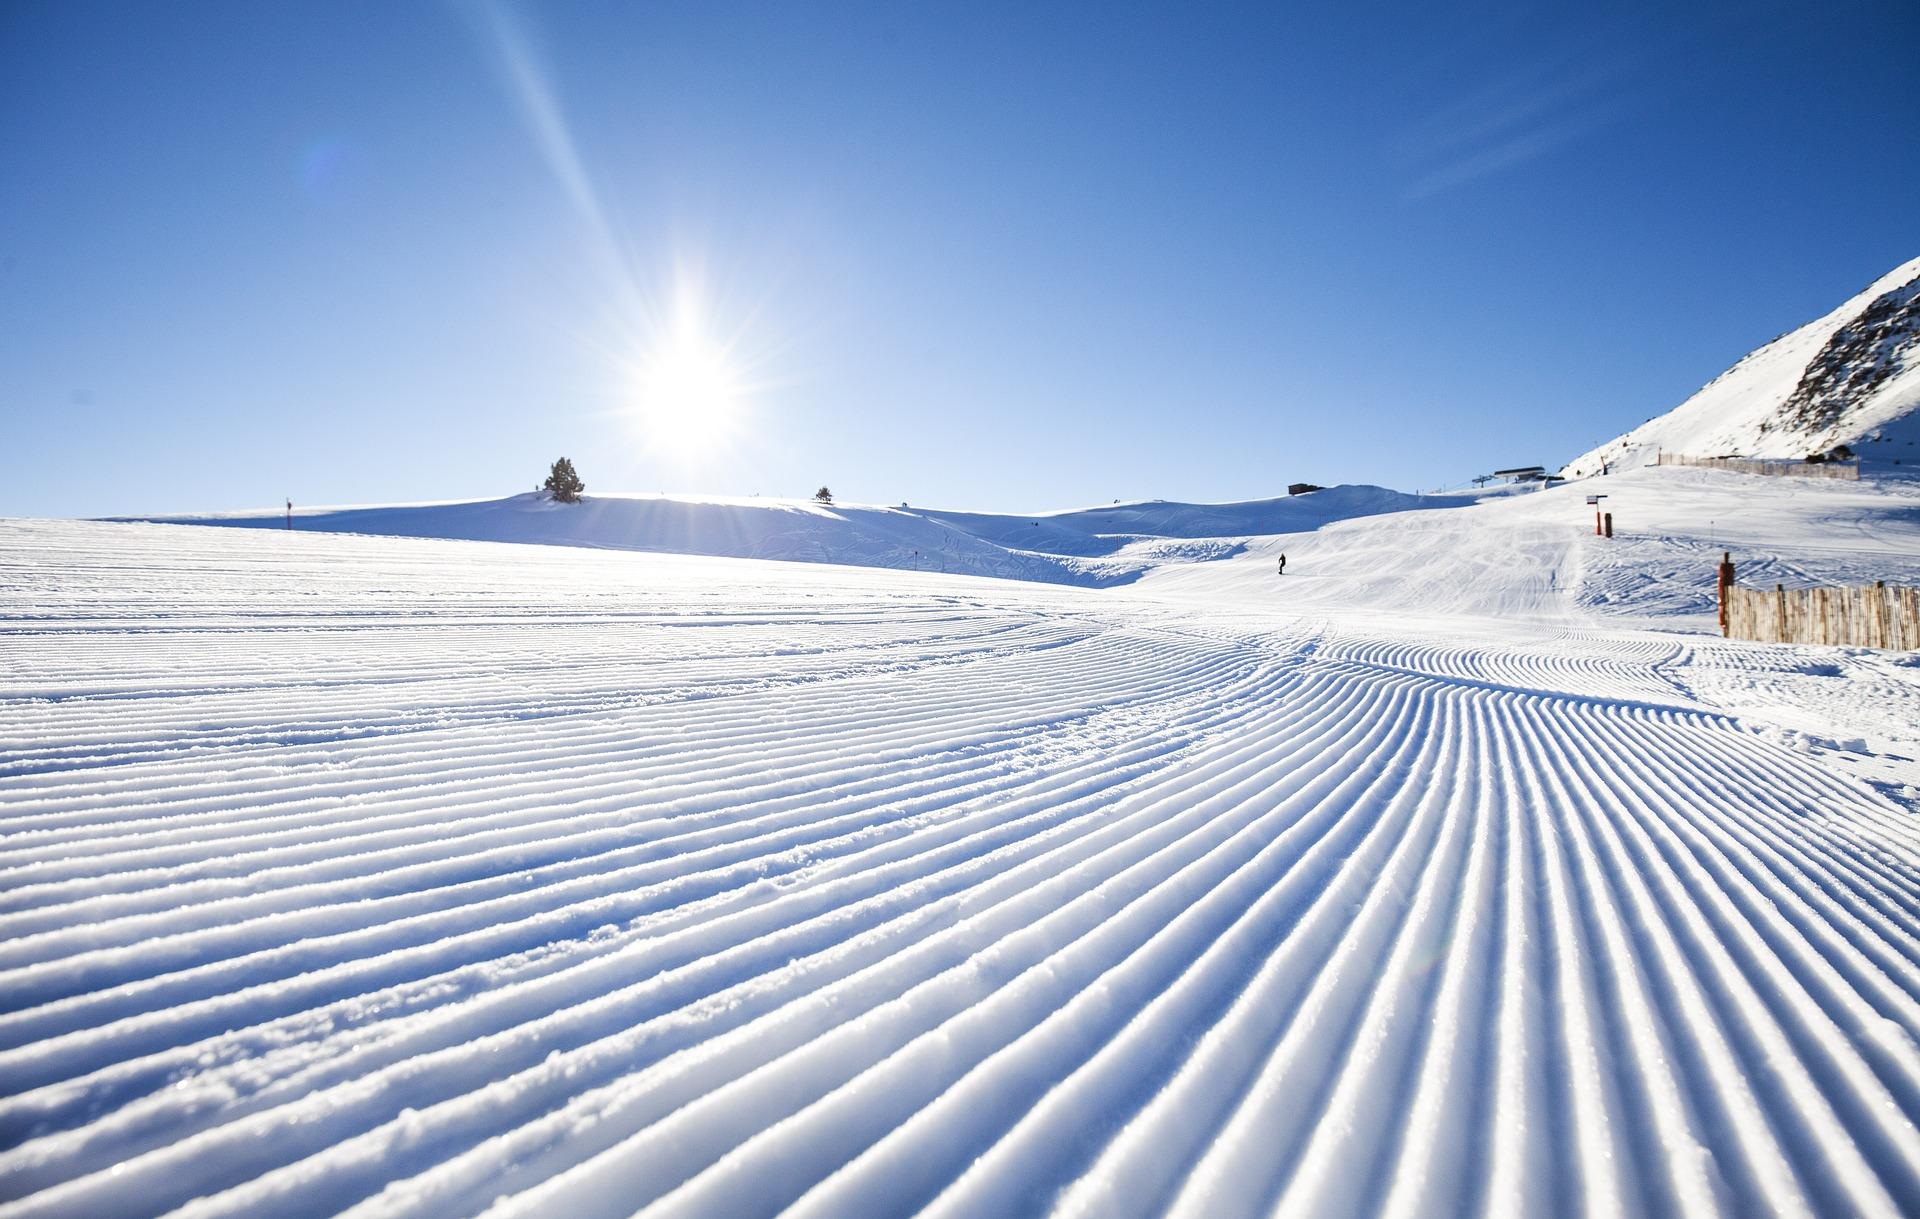 snow-1940192_1920